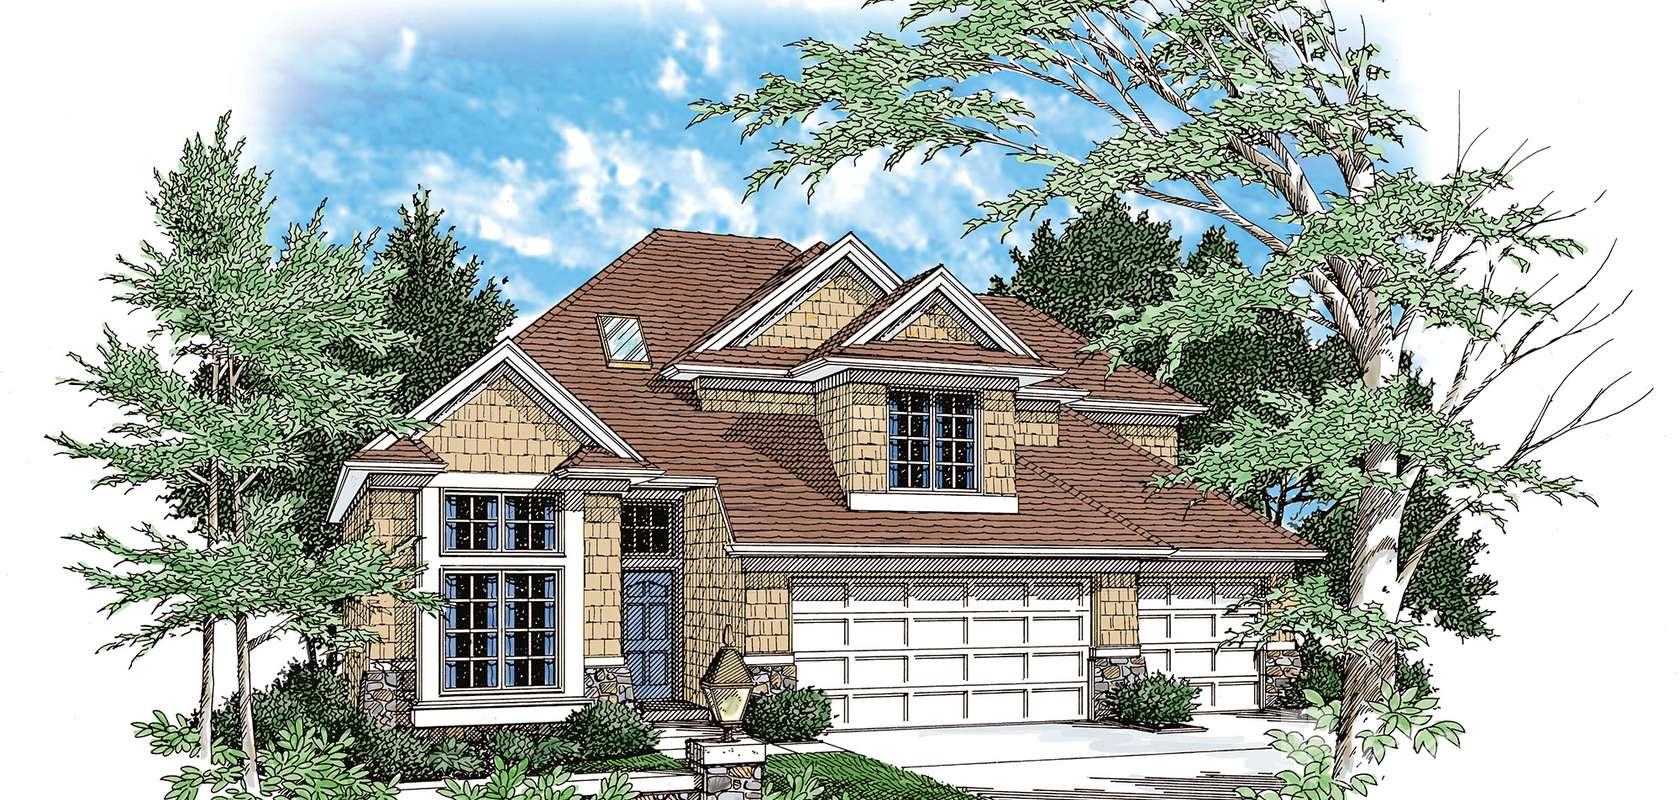 Mascord House Plan 2149C: The Coburn